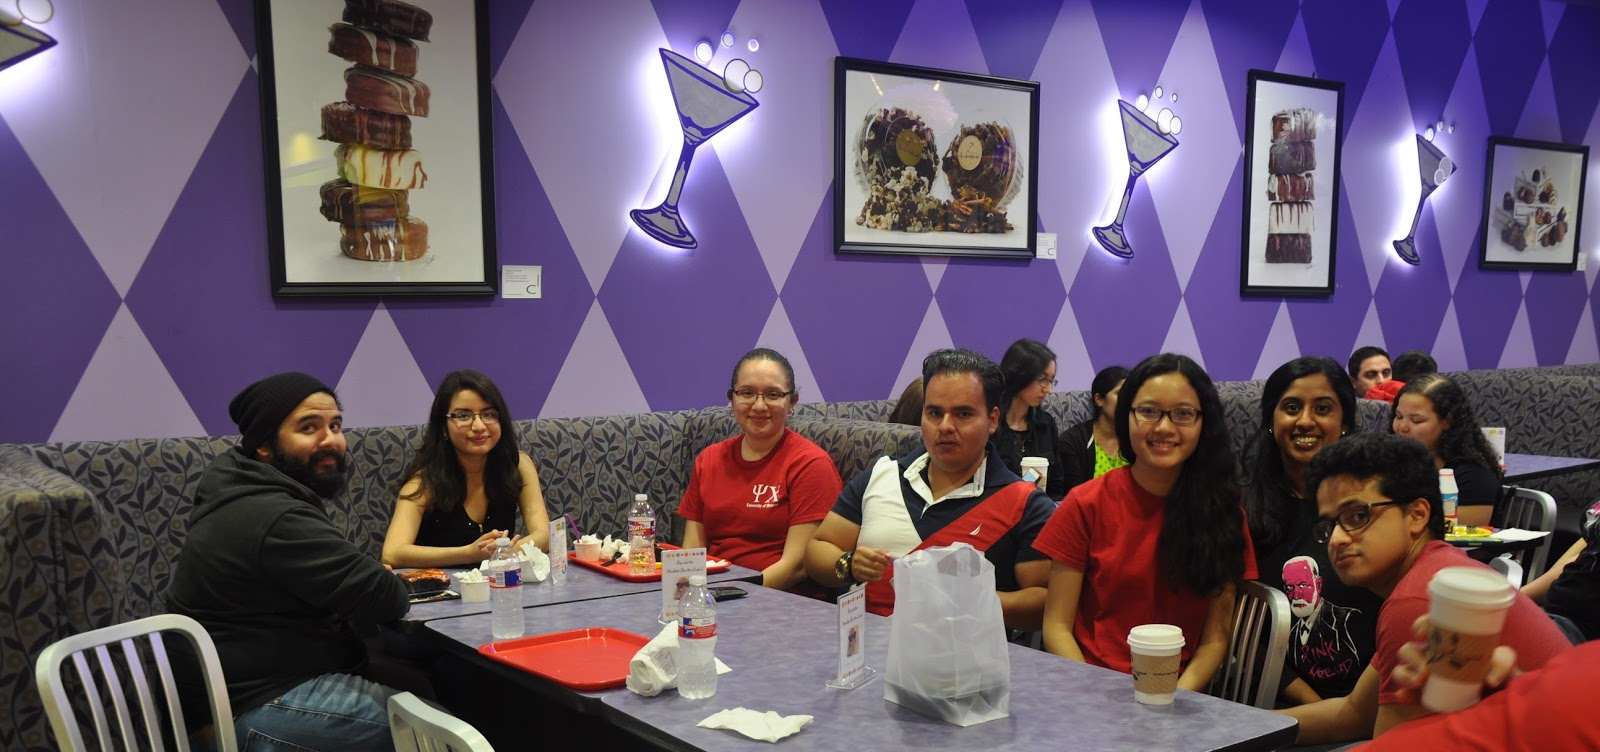 Psi Chi-University of Houston: Chocolate Bar Social